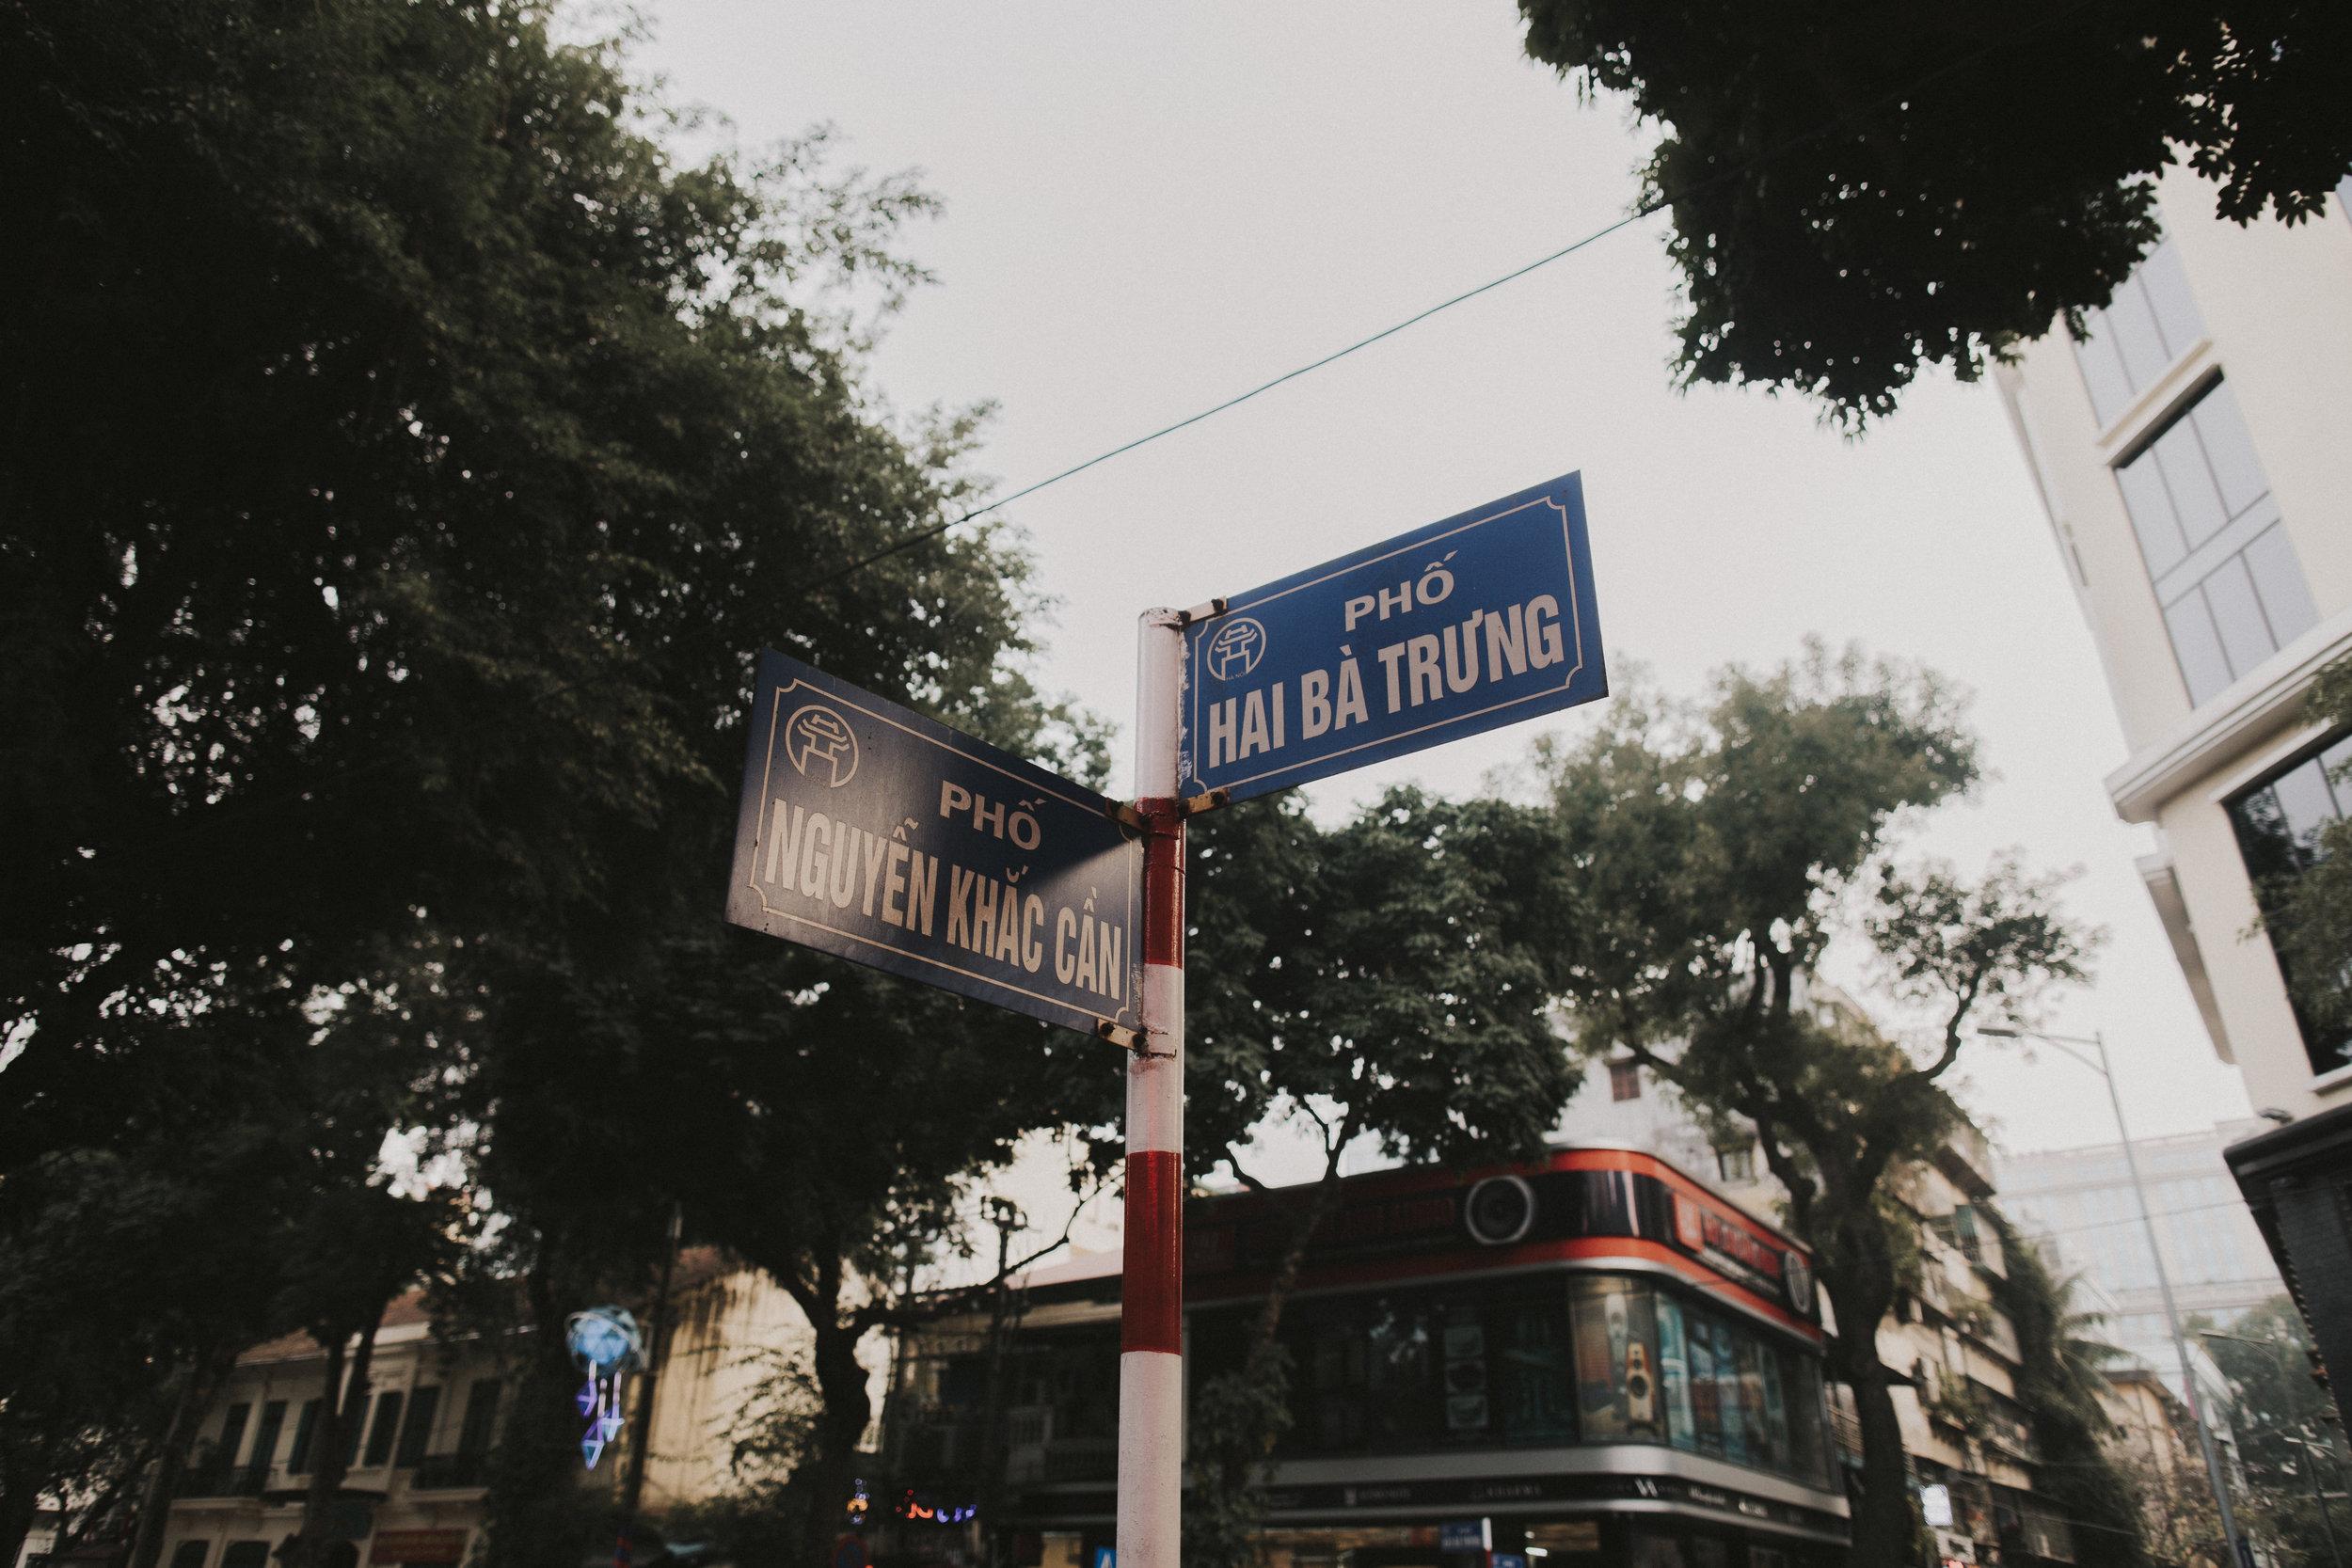 Crossroads in Hanoi